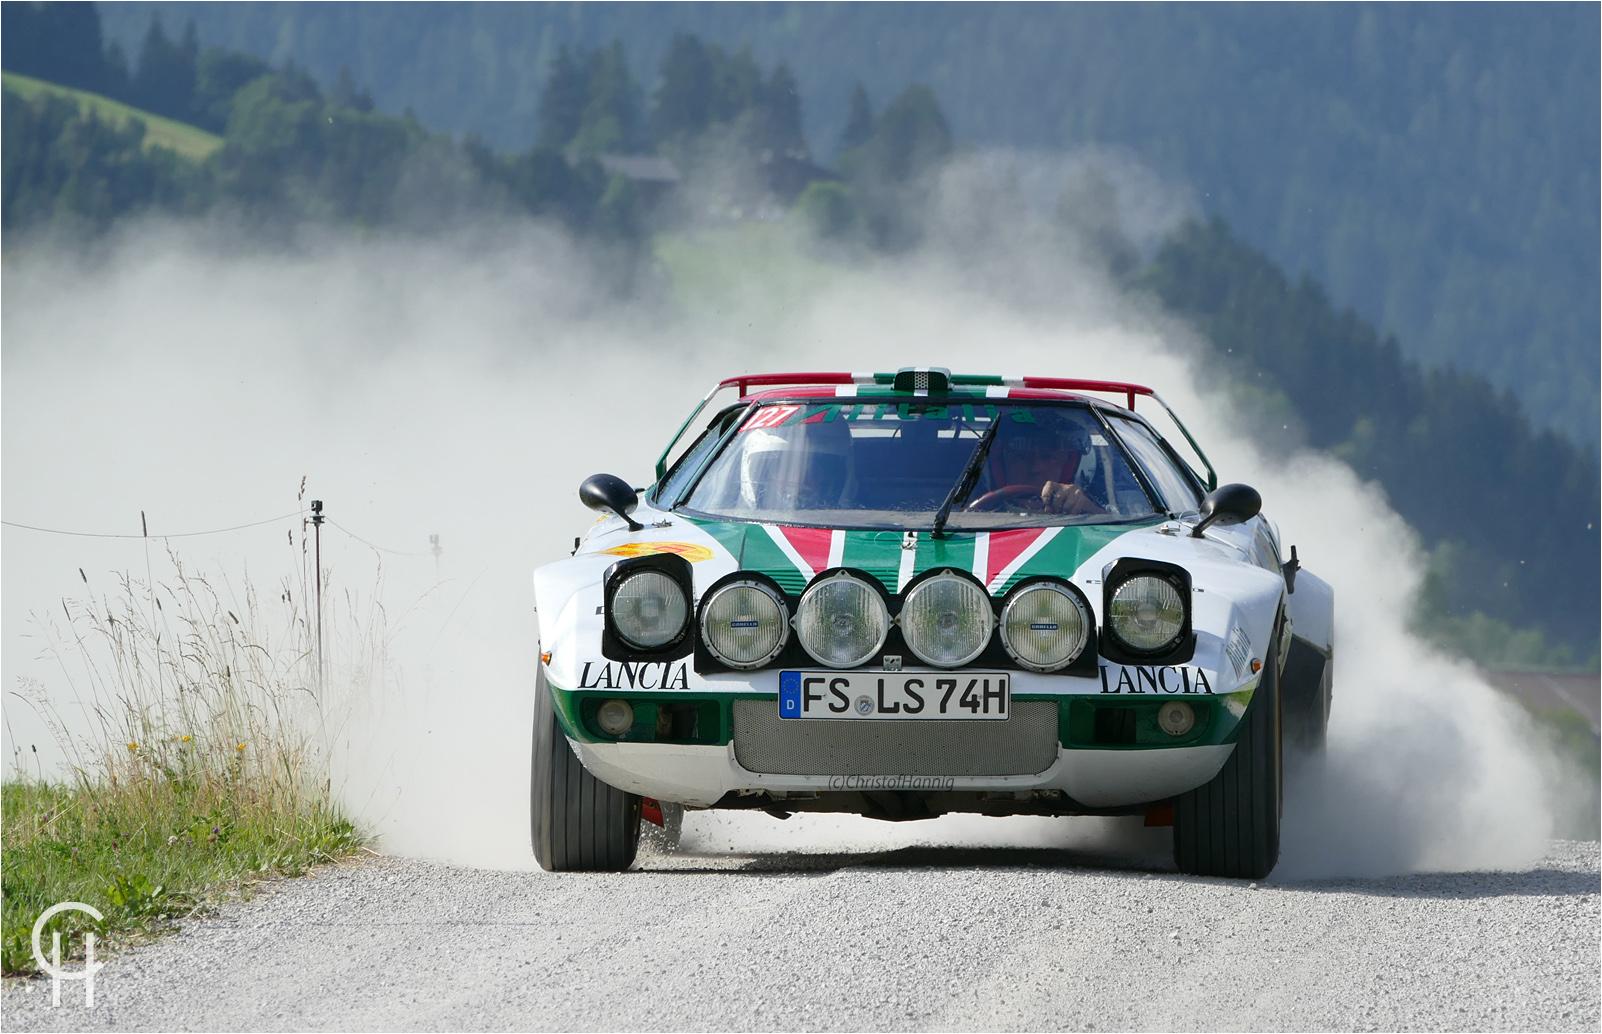 I like Lancia Stratos HF